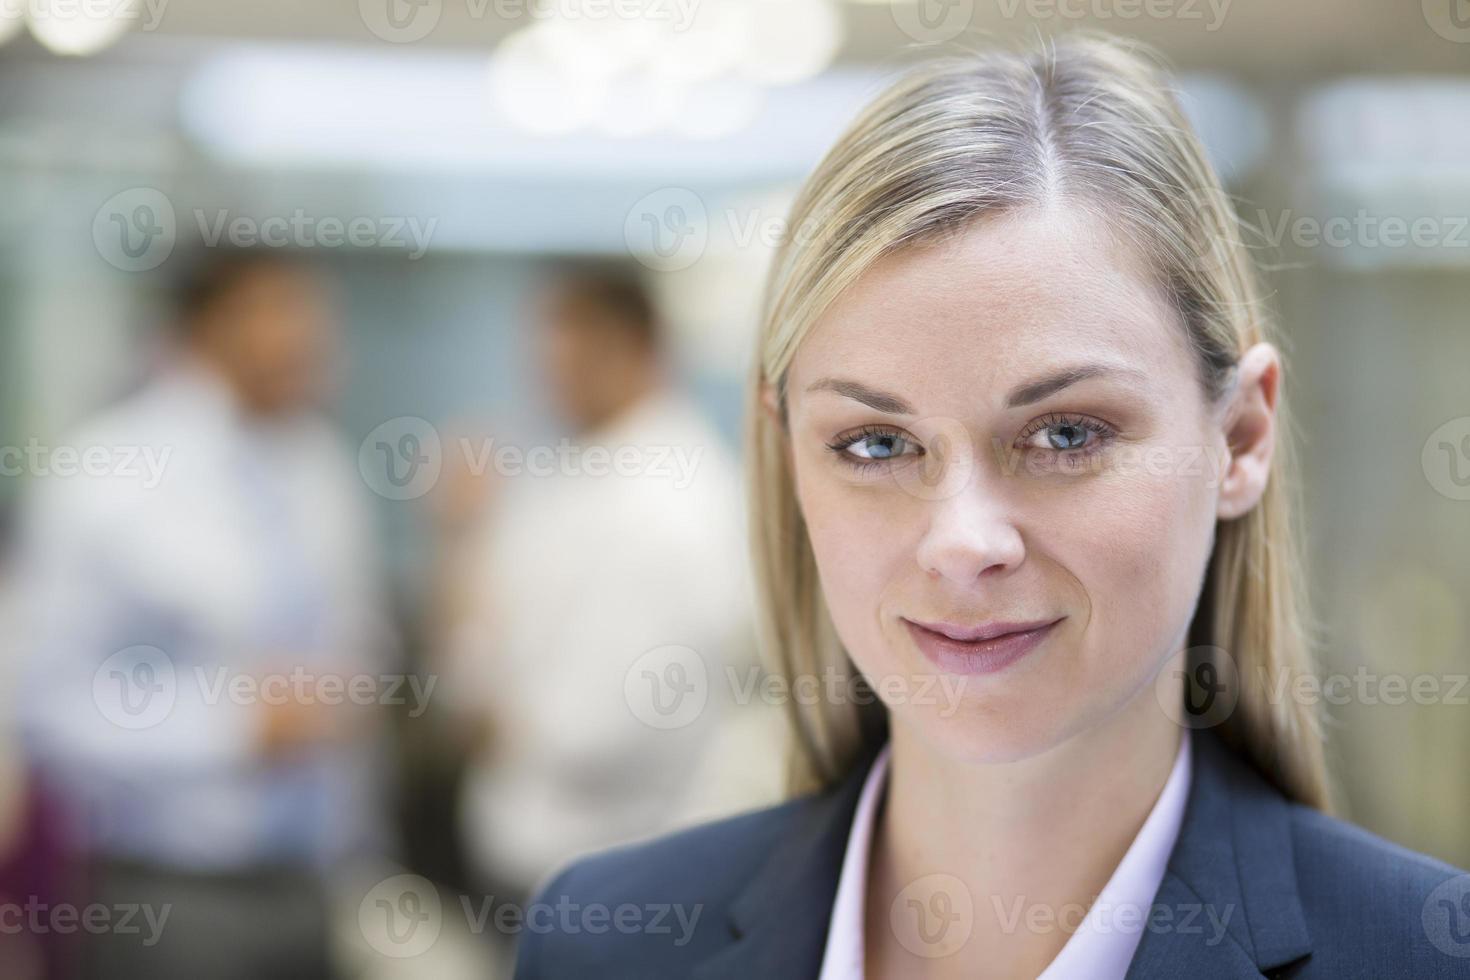 mooie zakenvrouw poseren terwijl collega's samen praten in de achtergrond foto